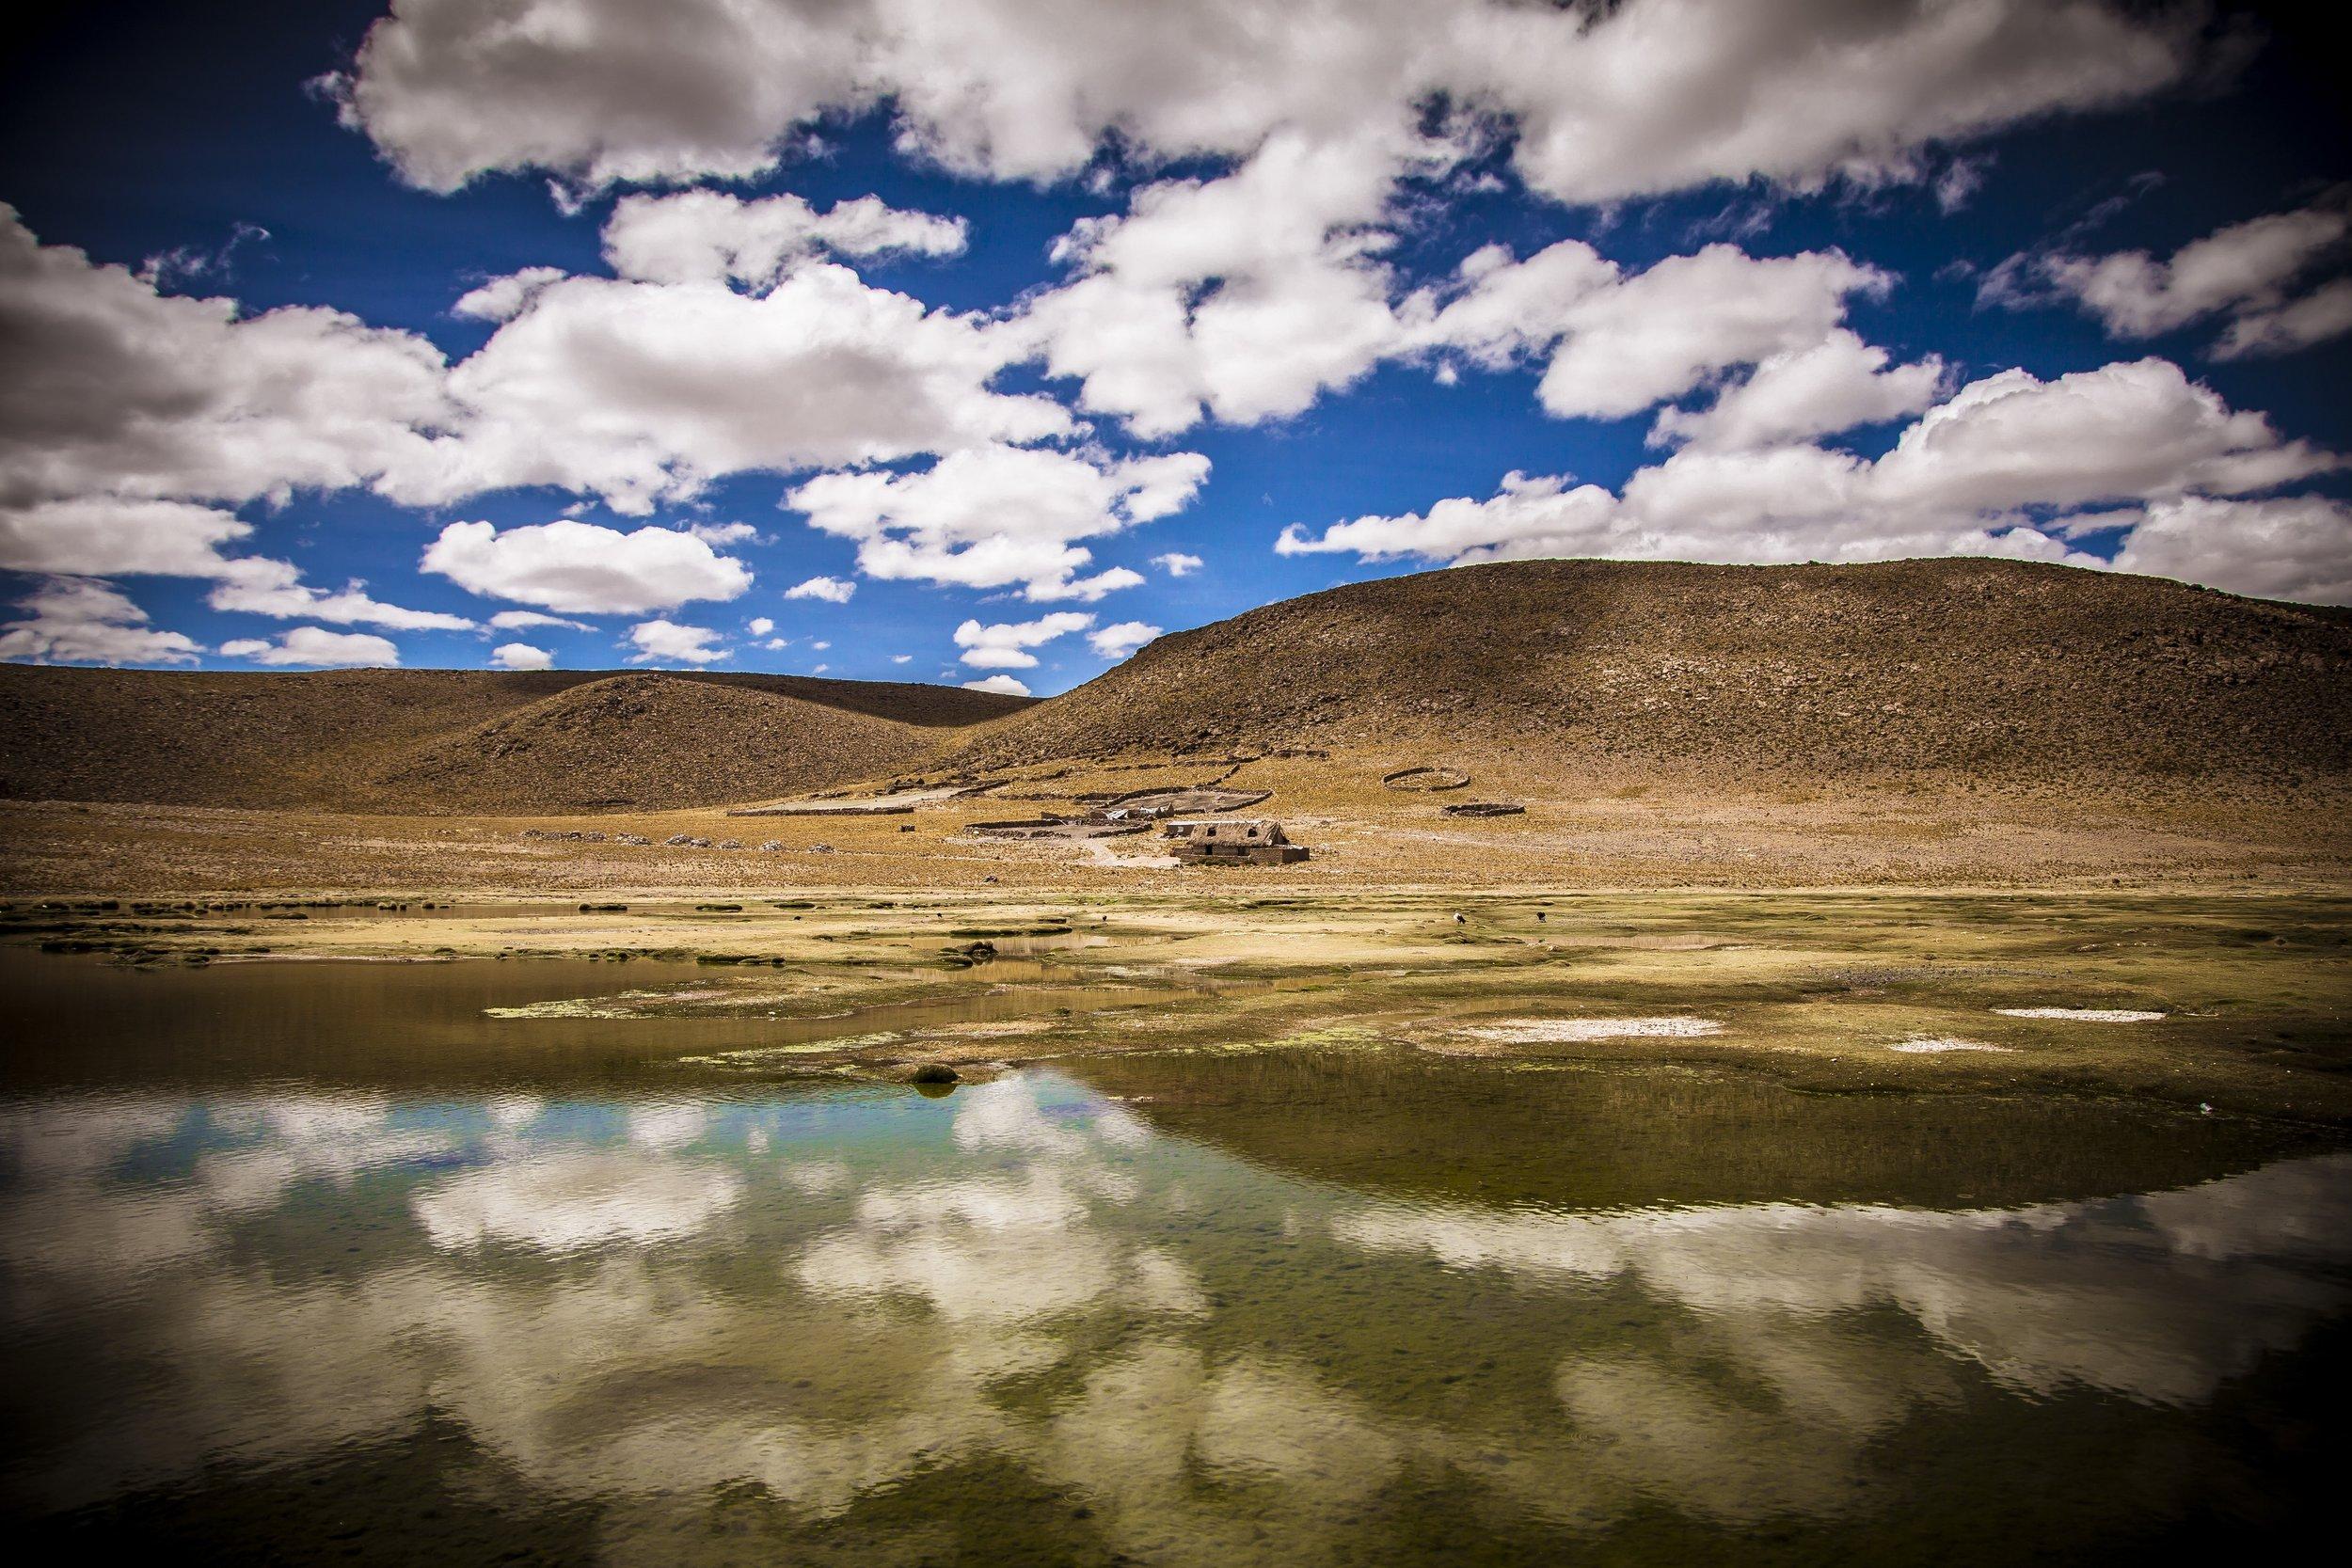 Camino_al_Colca_02.jpg